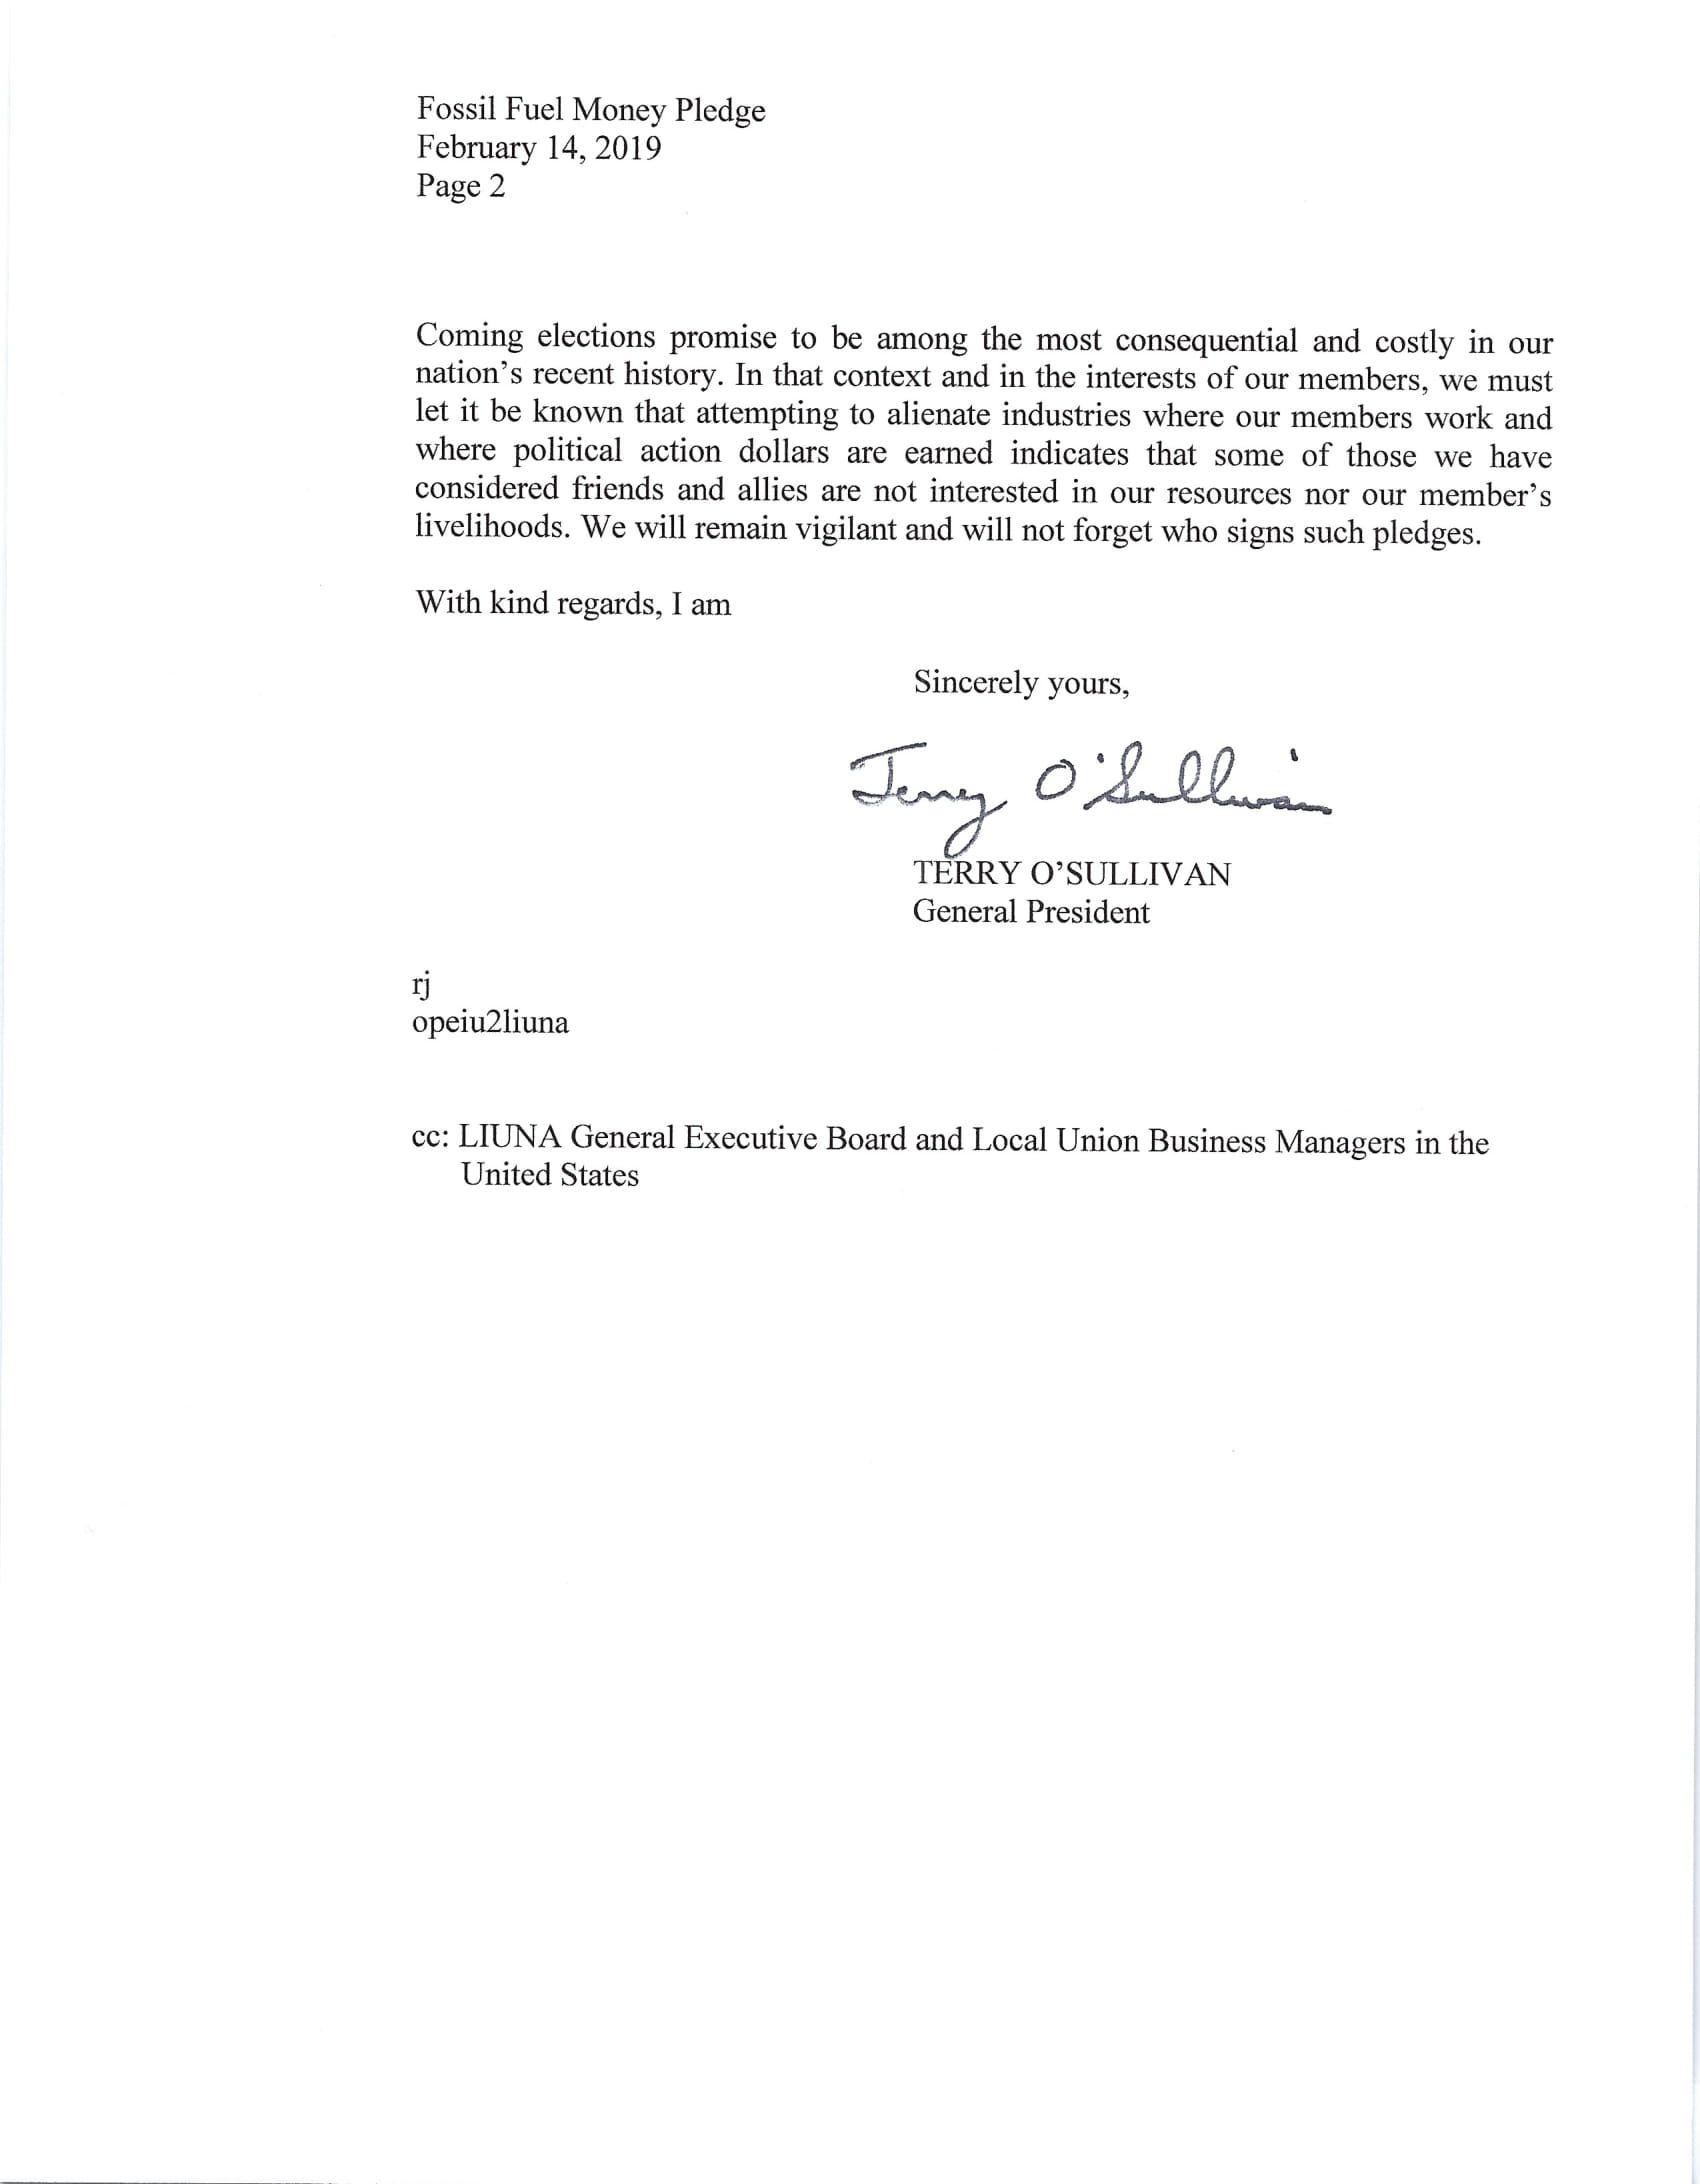 House Fossil Fuel Money Pledge Ltr Feb 2019-2.jpg